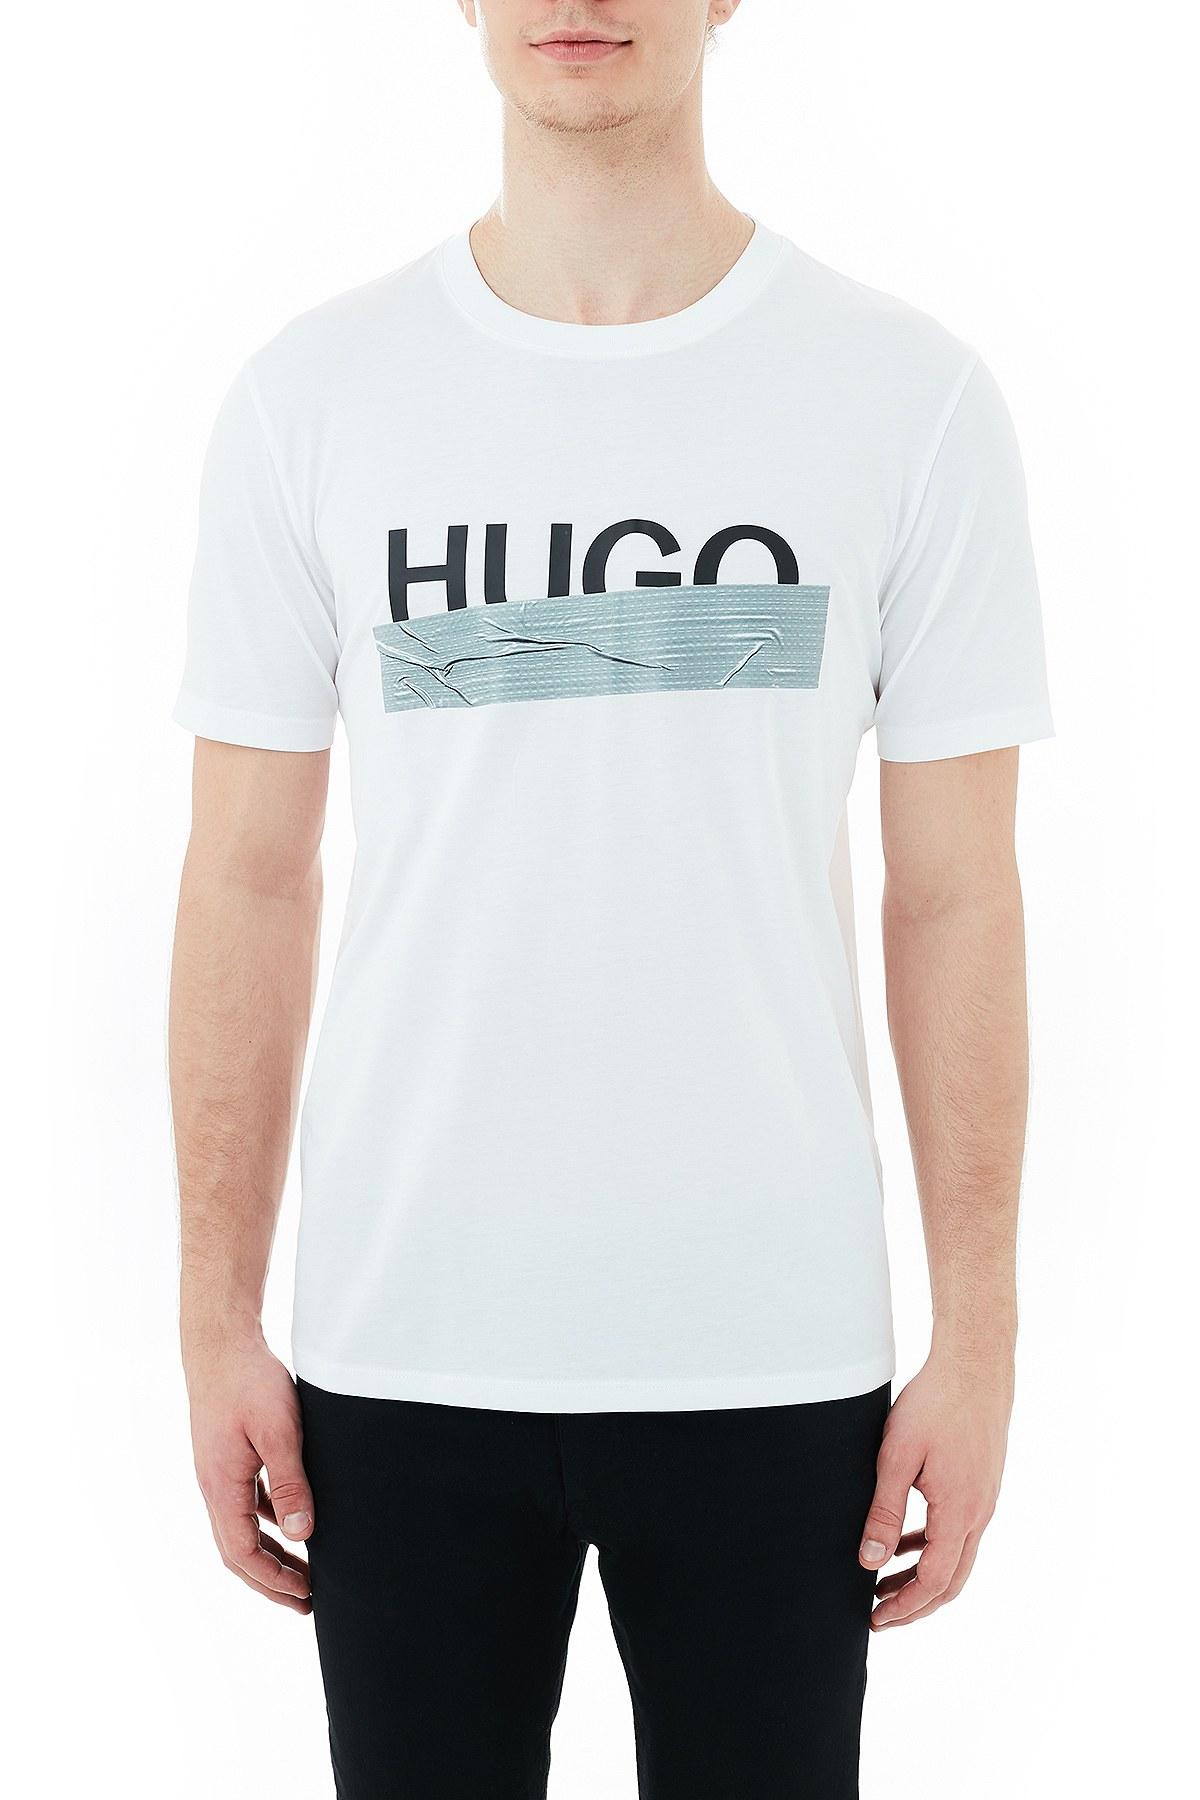 Hugo Boss Regular Fit Baskılı Bisiklet Yaka % 100 Pamuk Erkek T Shirt 50436413 100 BEYAZ